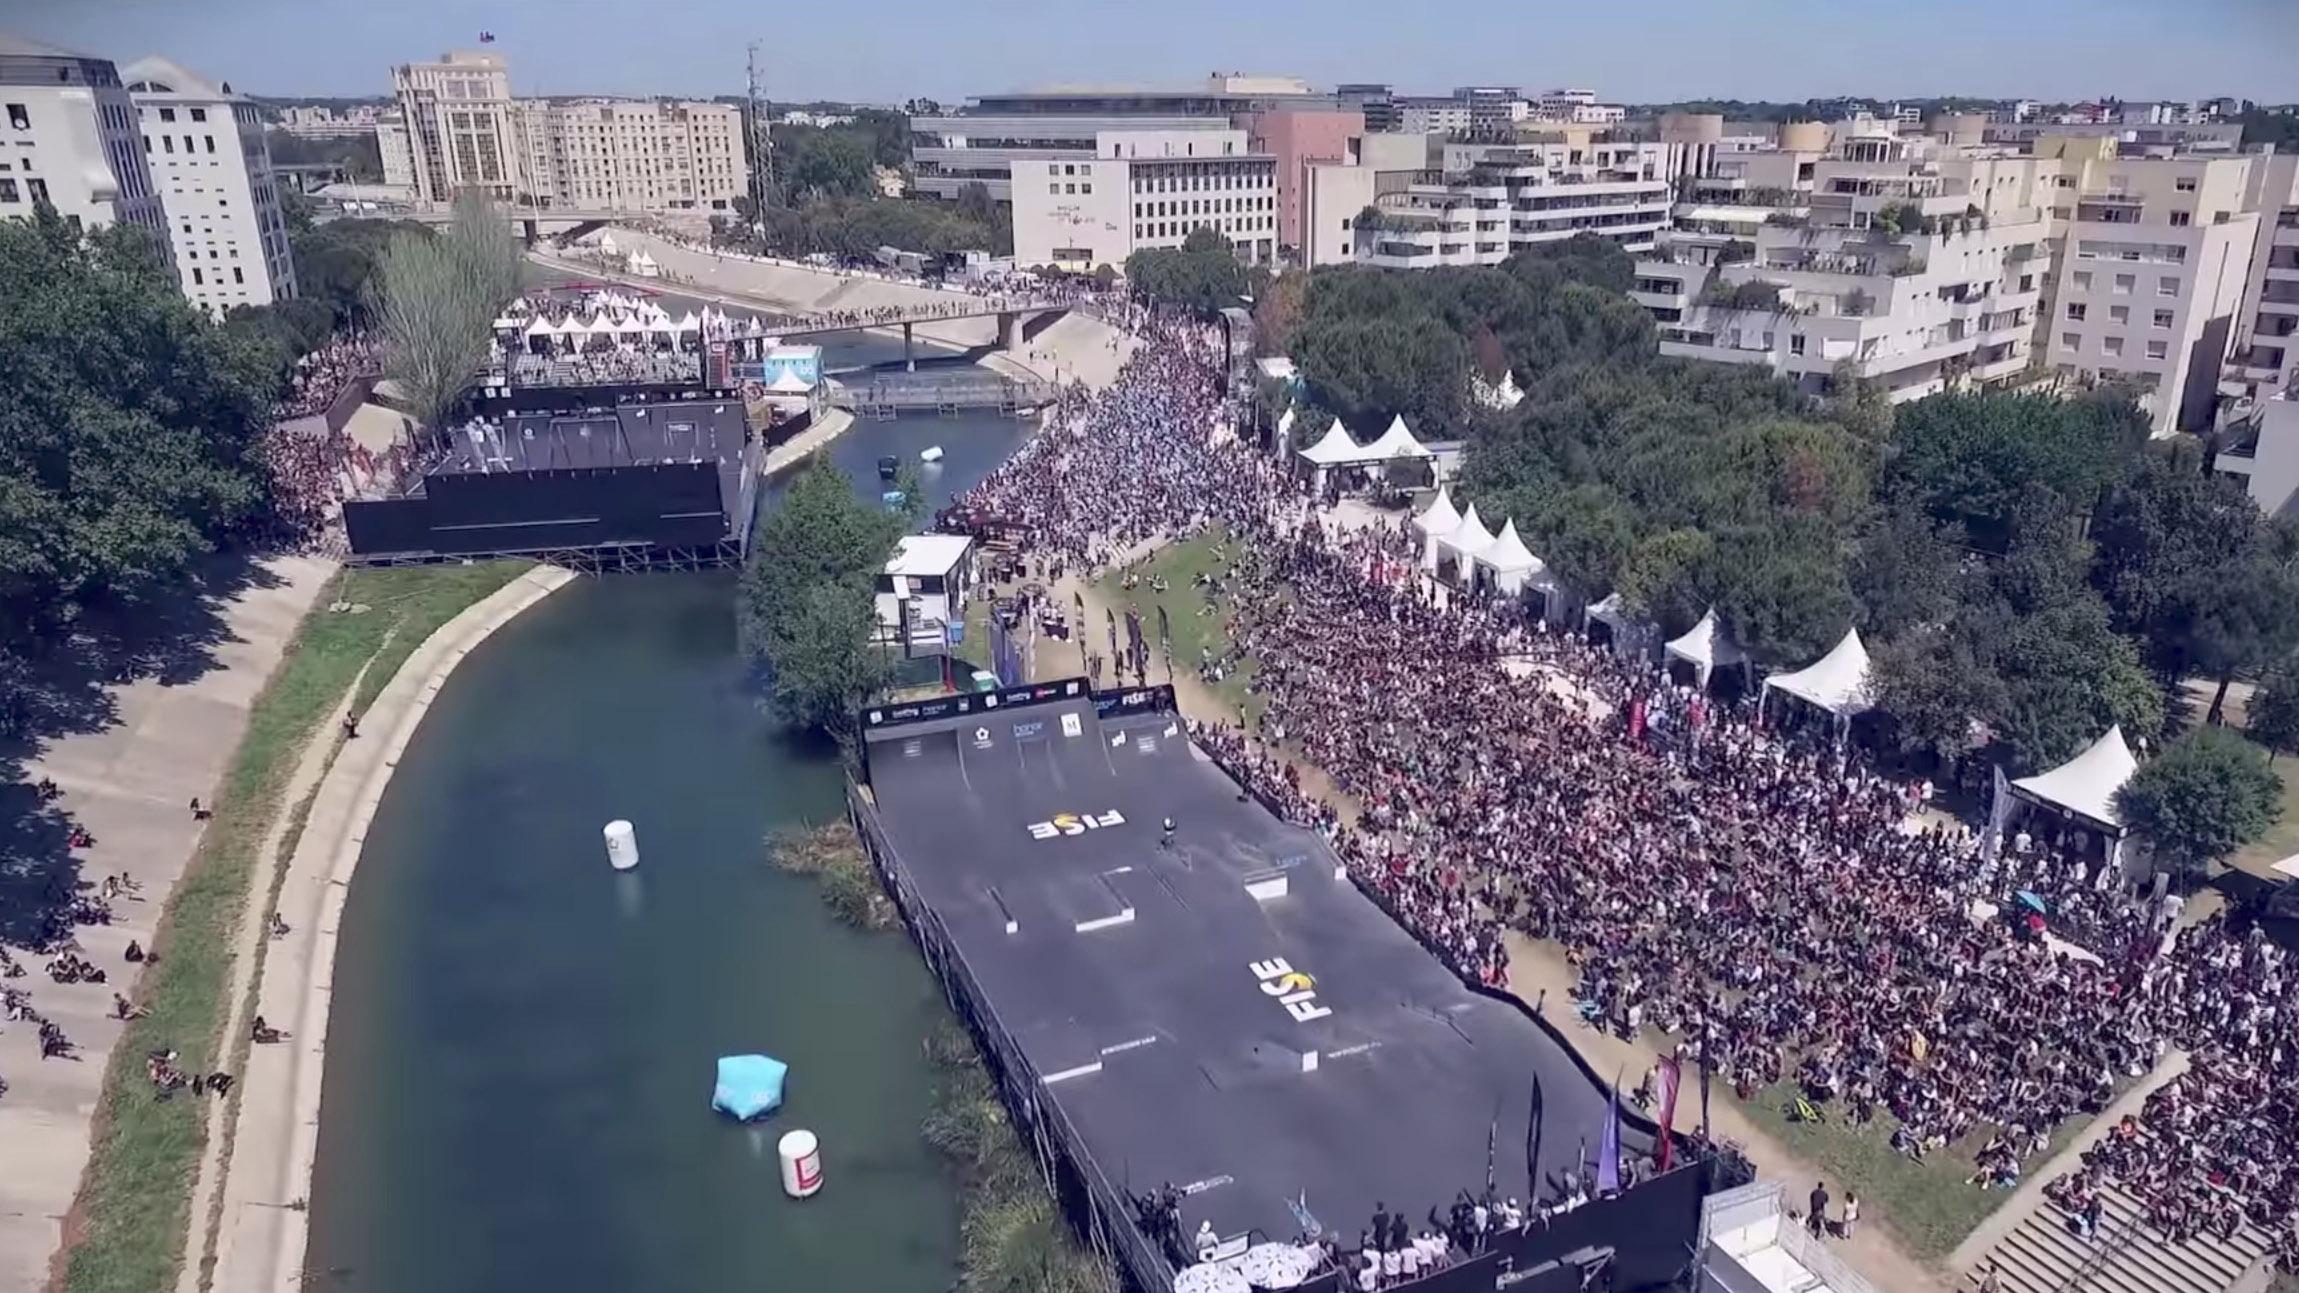 FISE WORLD SERIES 2017 ANNOUNCED